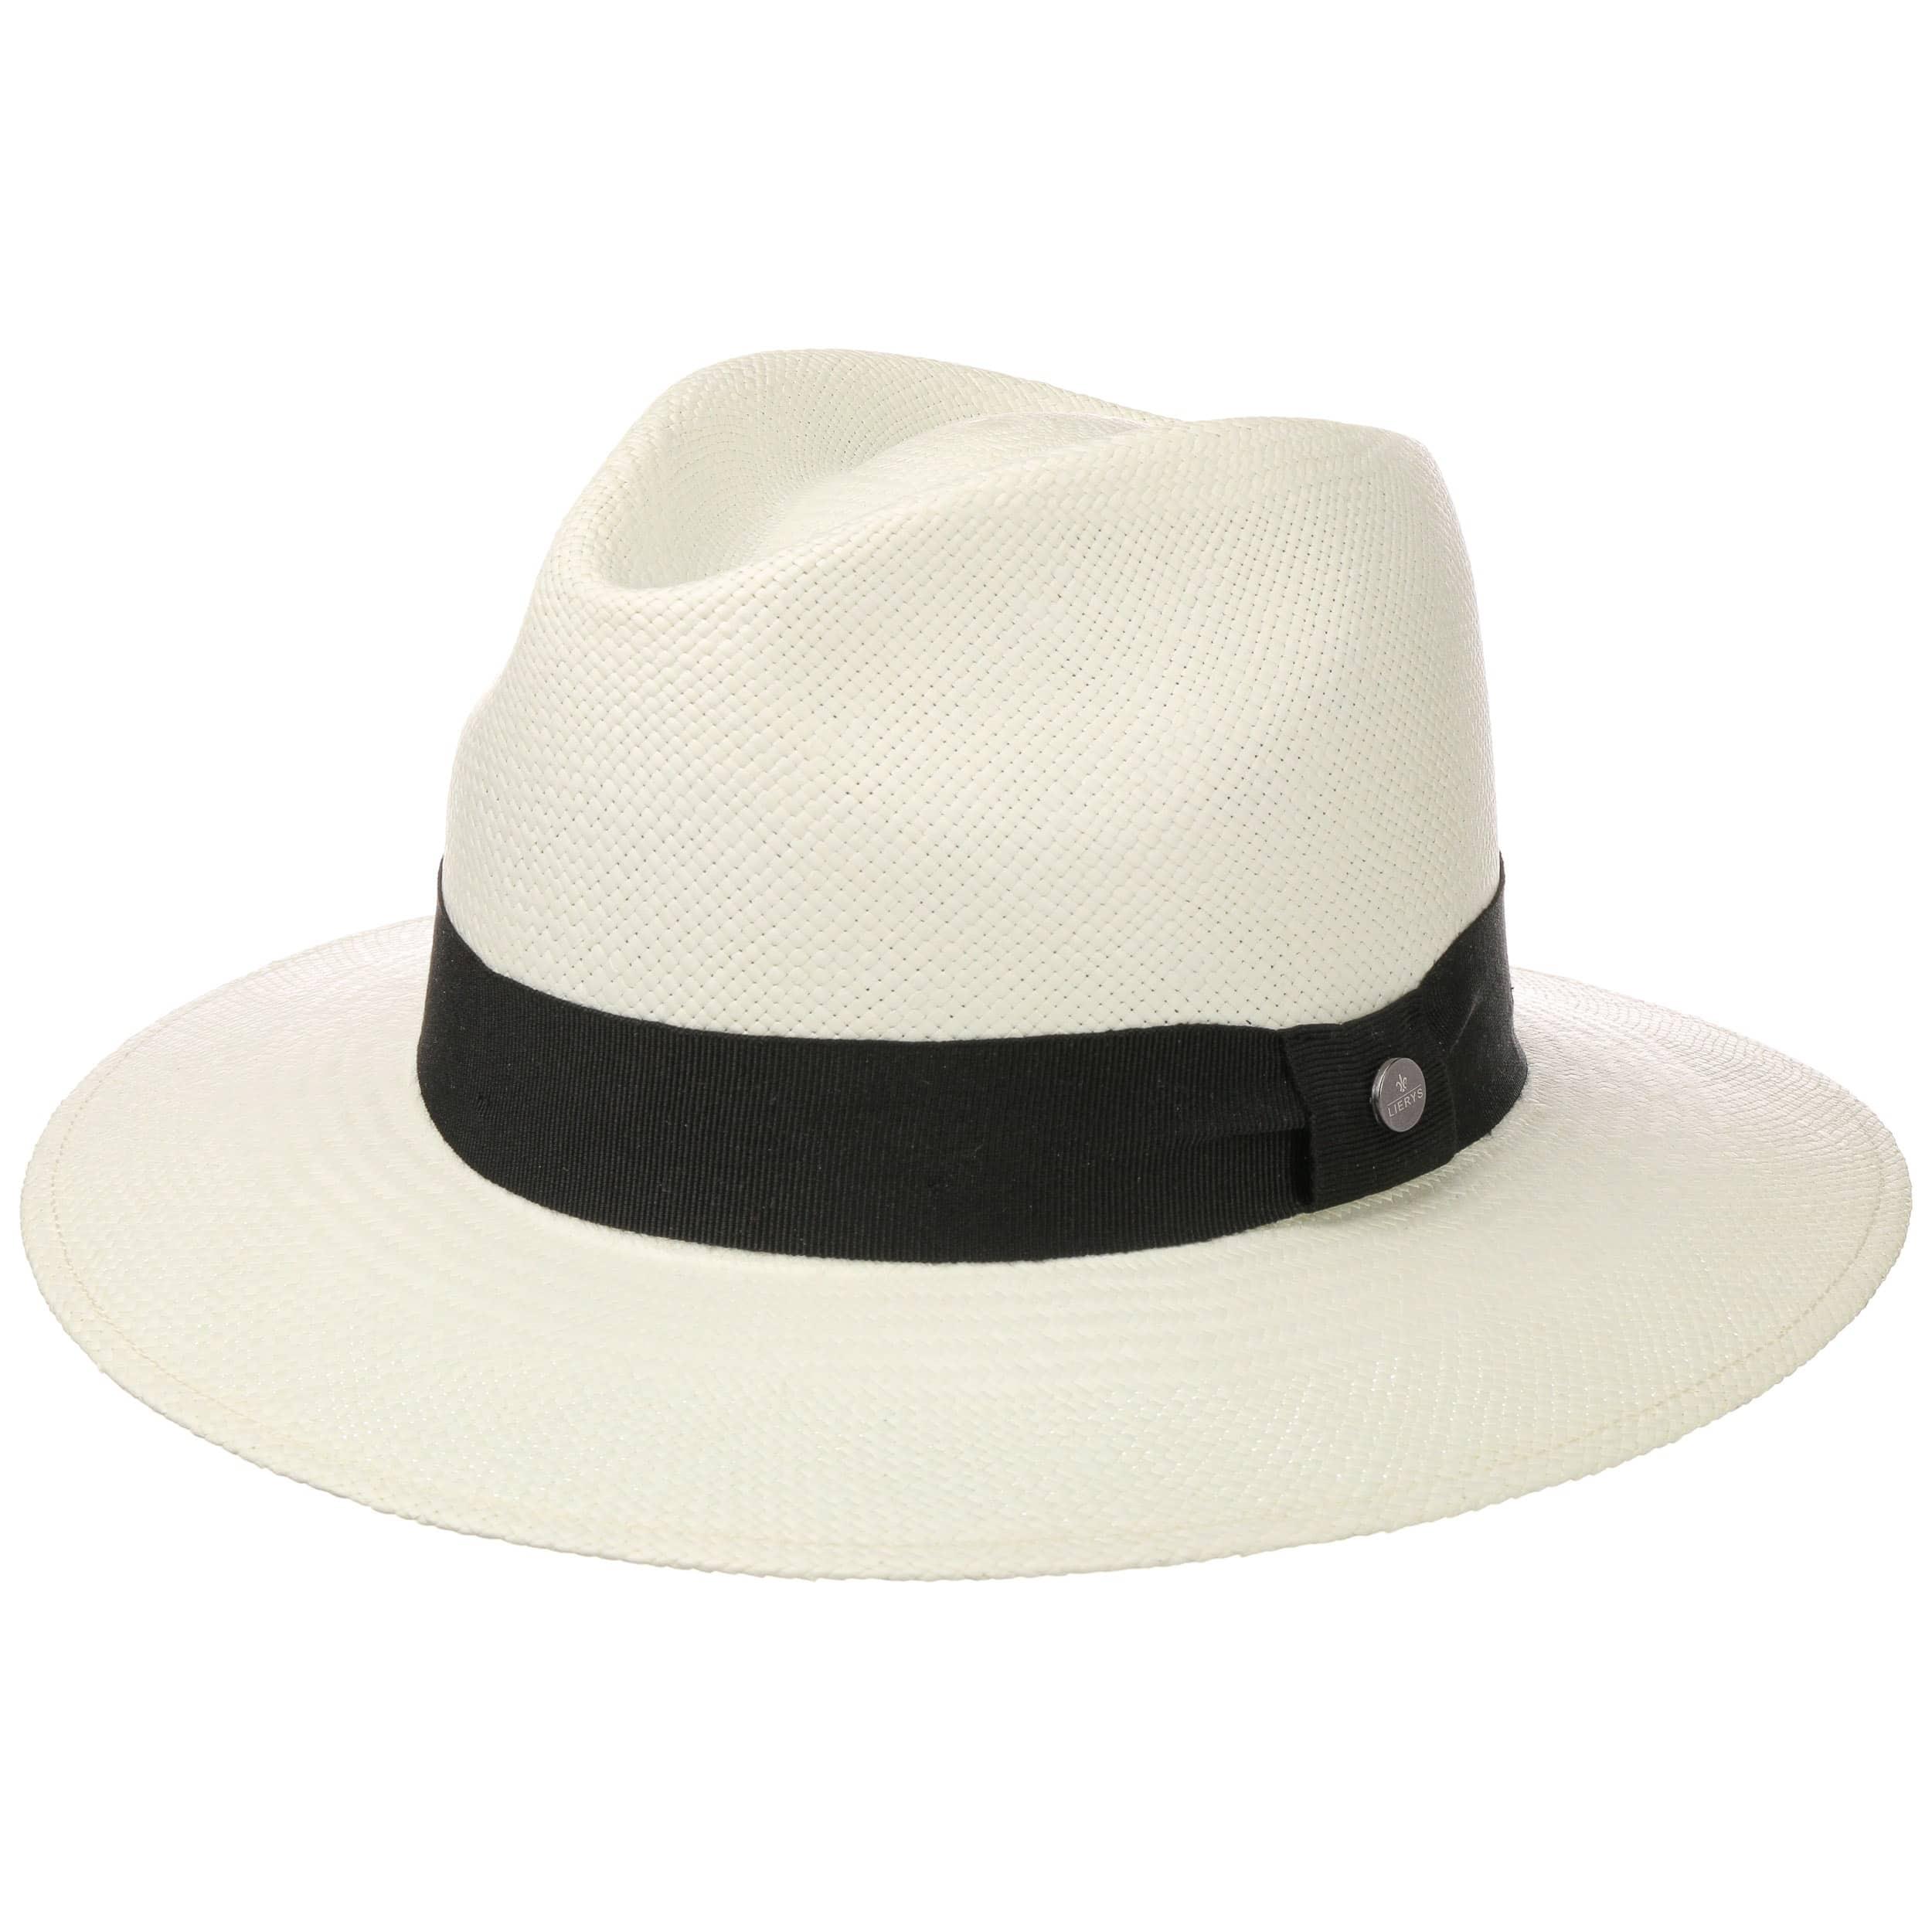 b93fb4ebfe ... Georgo Cappello Panama by Lierys - bianco-nero 1 ...